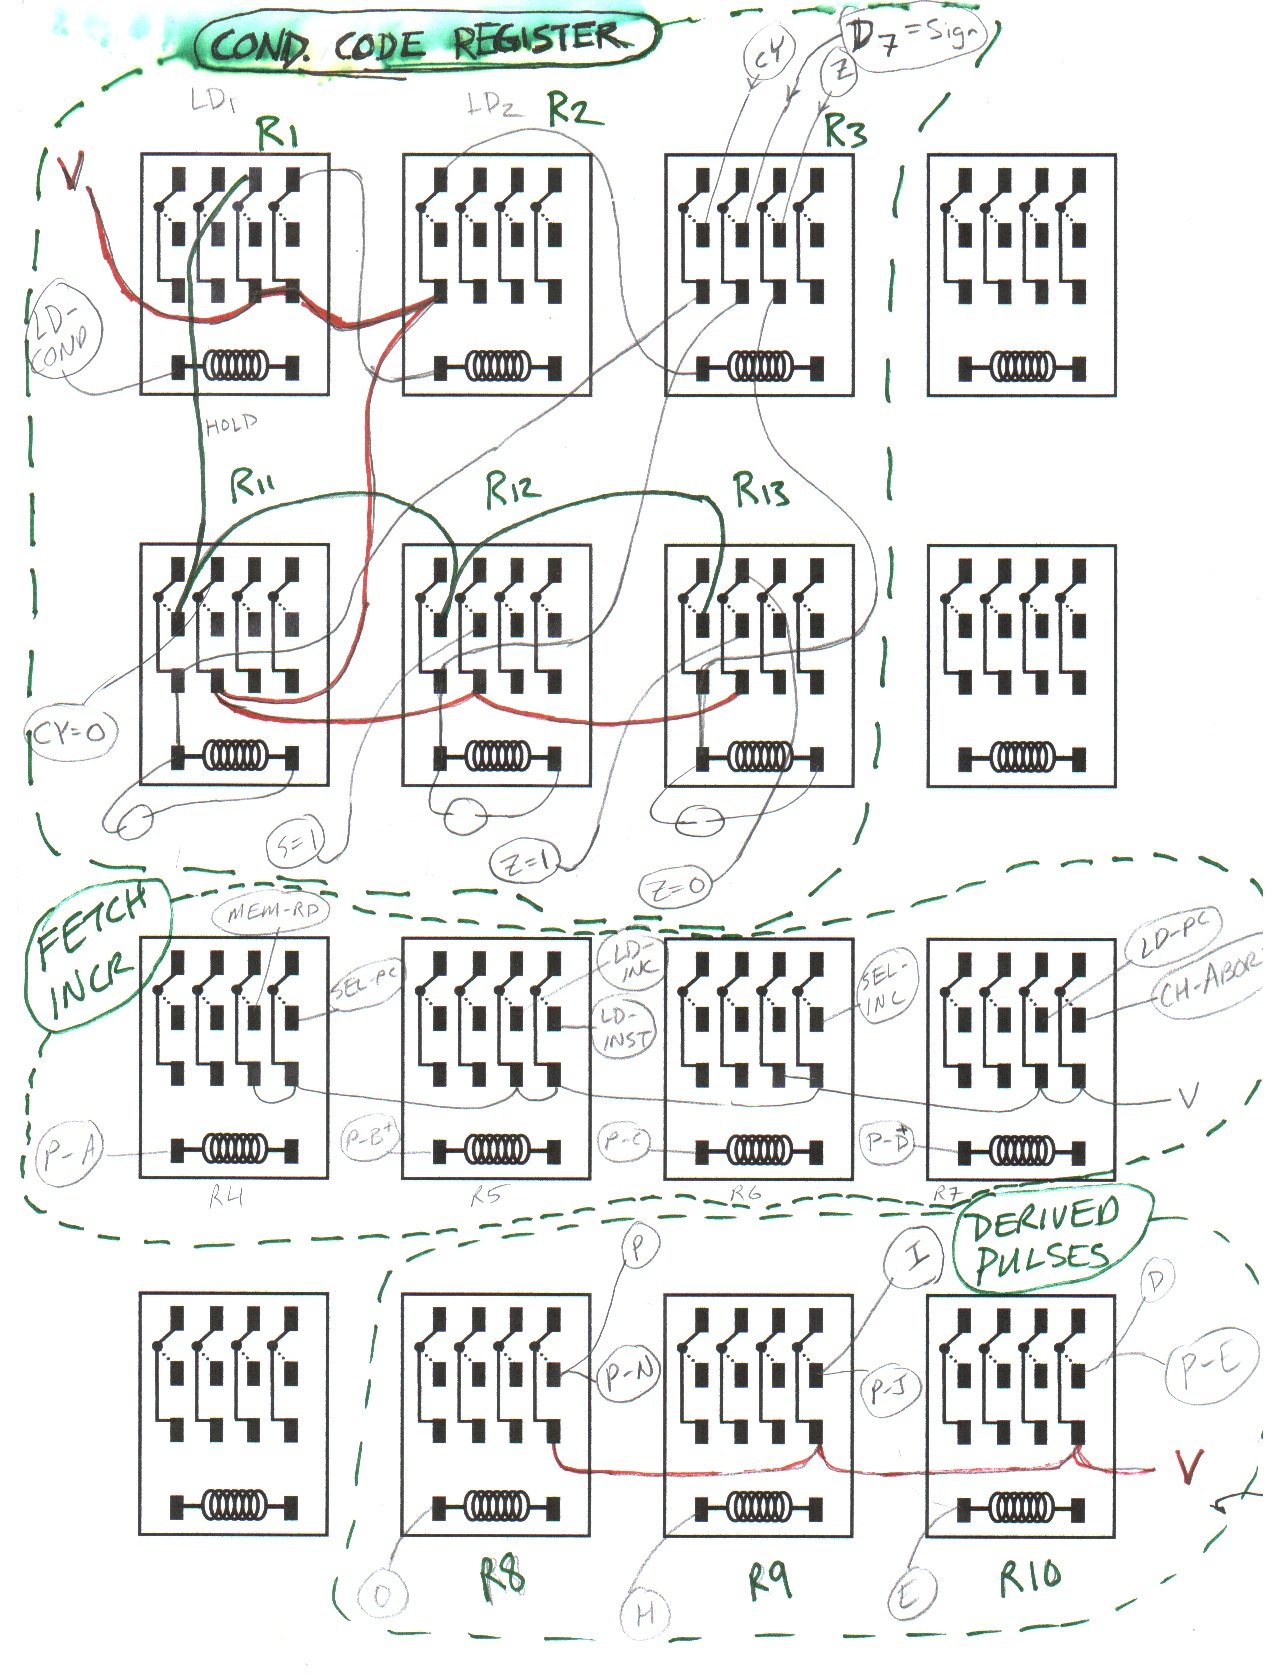 control wiring diagram symbols 1993 4l80e solenoid symbol in schematic get free image